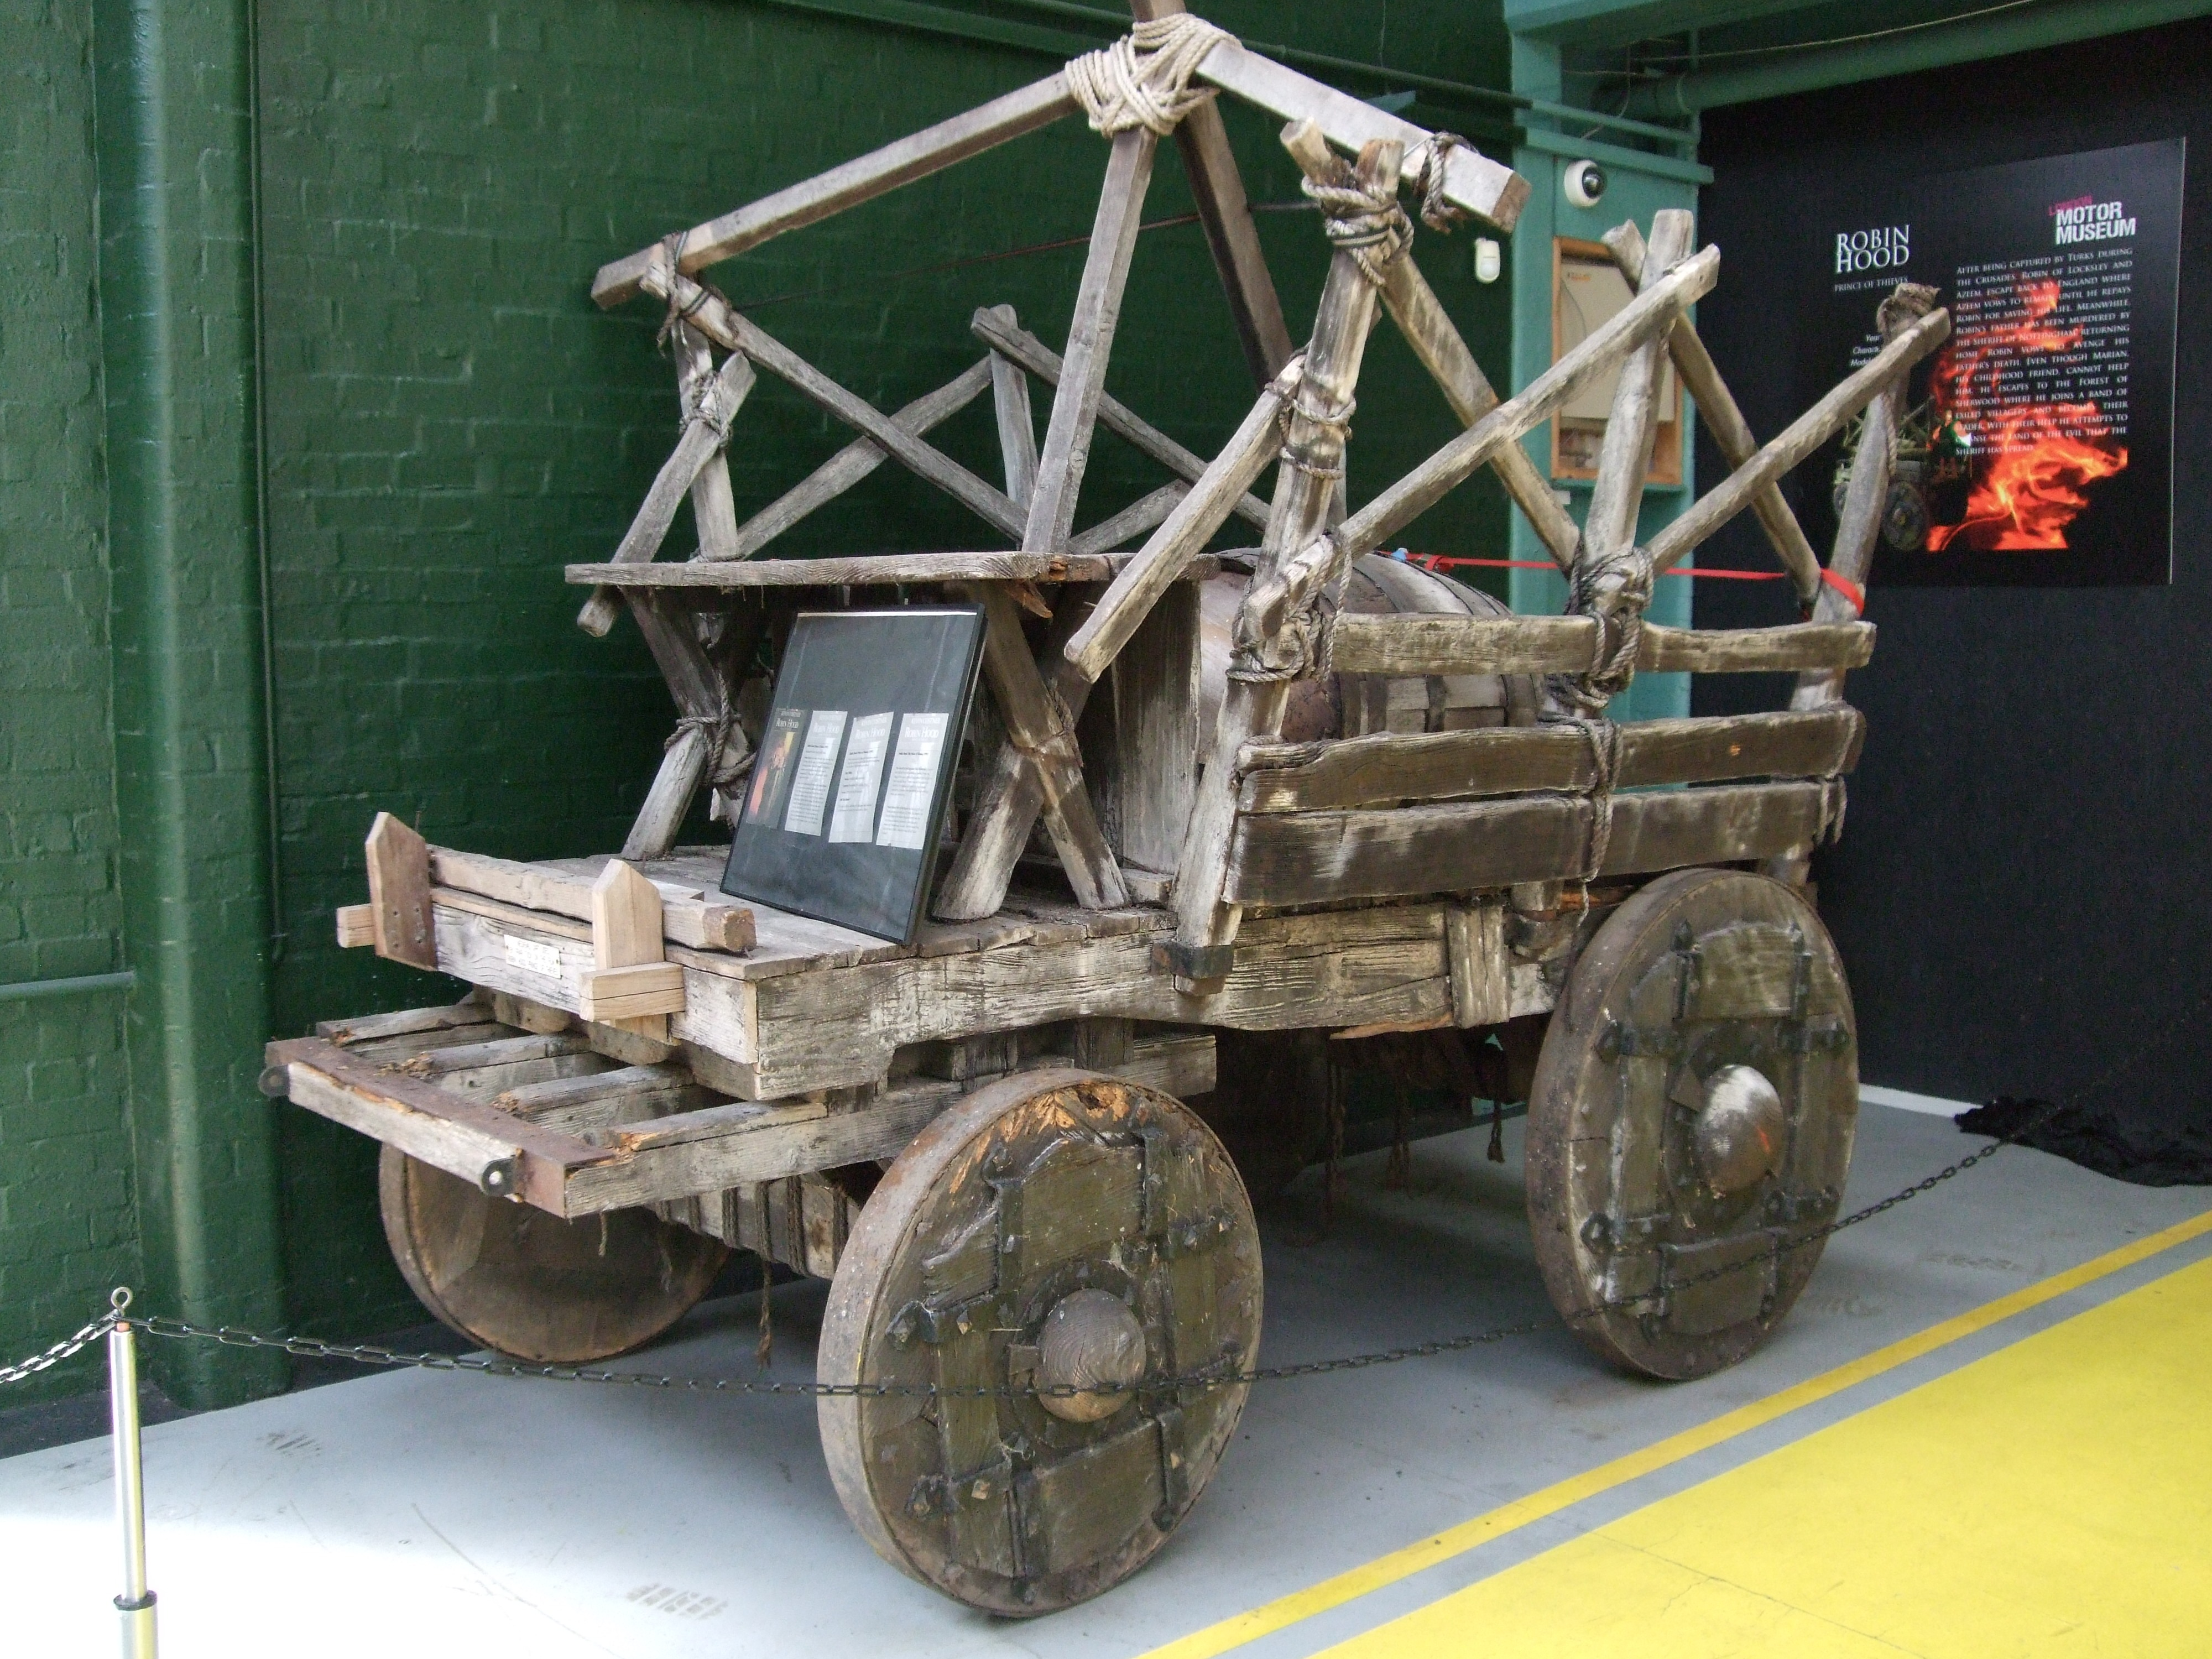 Robin Hood medieval wagon